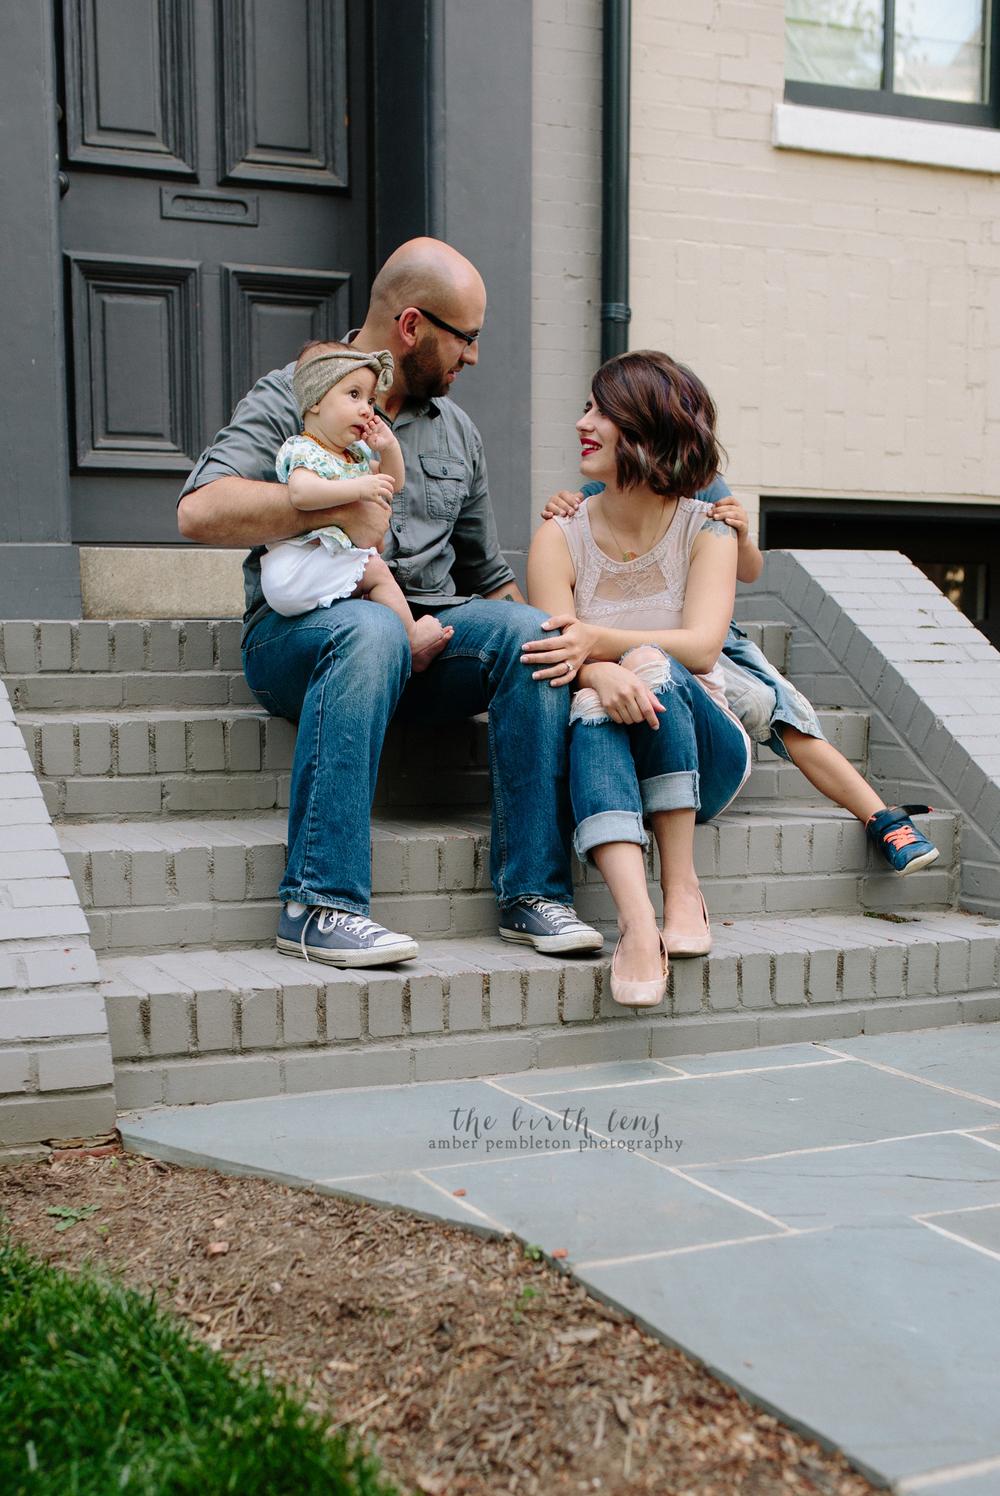 lifestylefamilynorthernvirginia.jpg